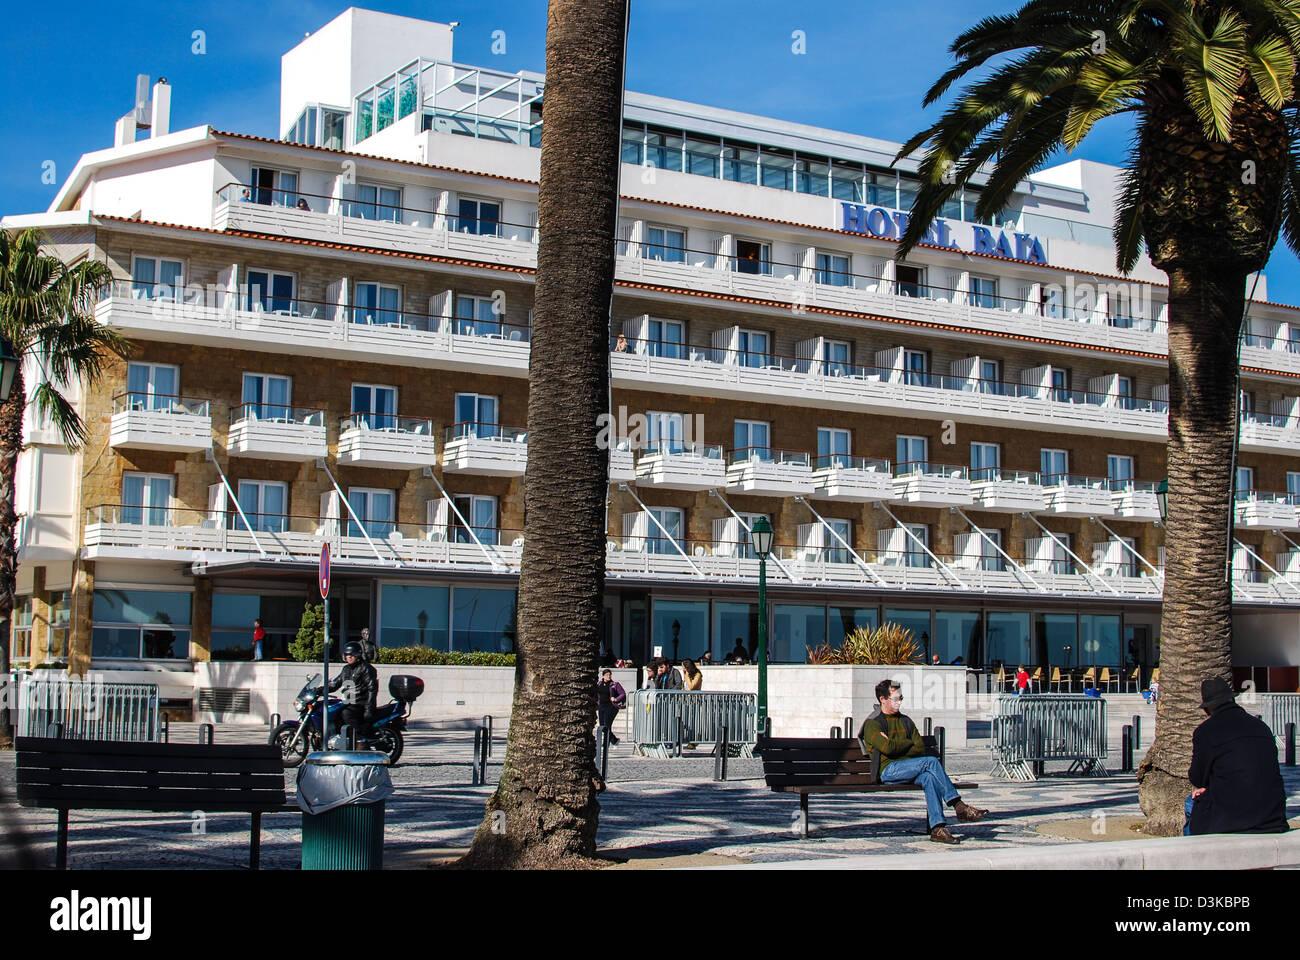 Hotel Baia Cascais : Hotel baia cascais portugal stock photo: 53901411 alamy